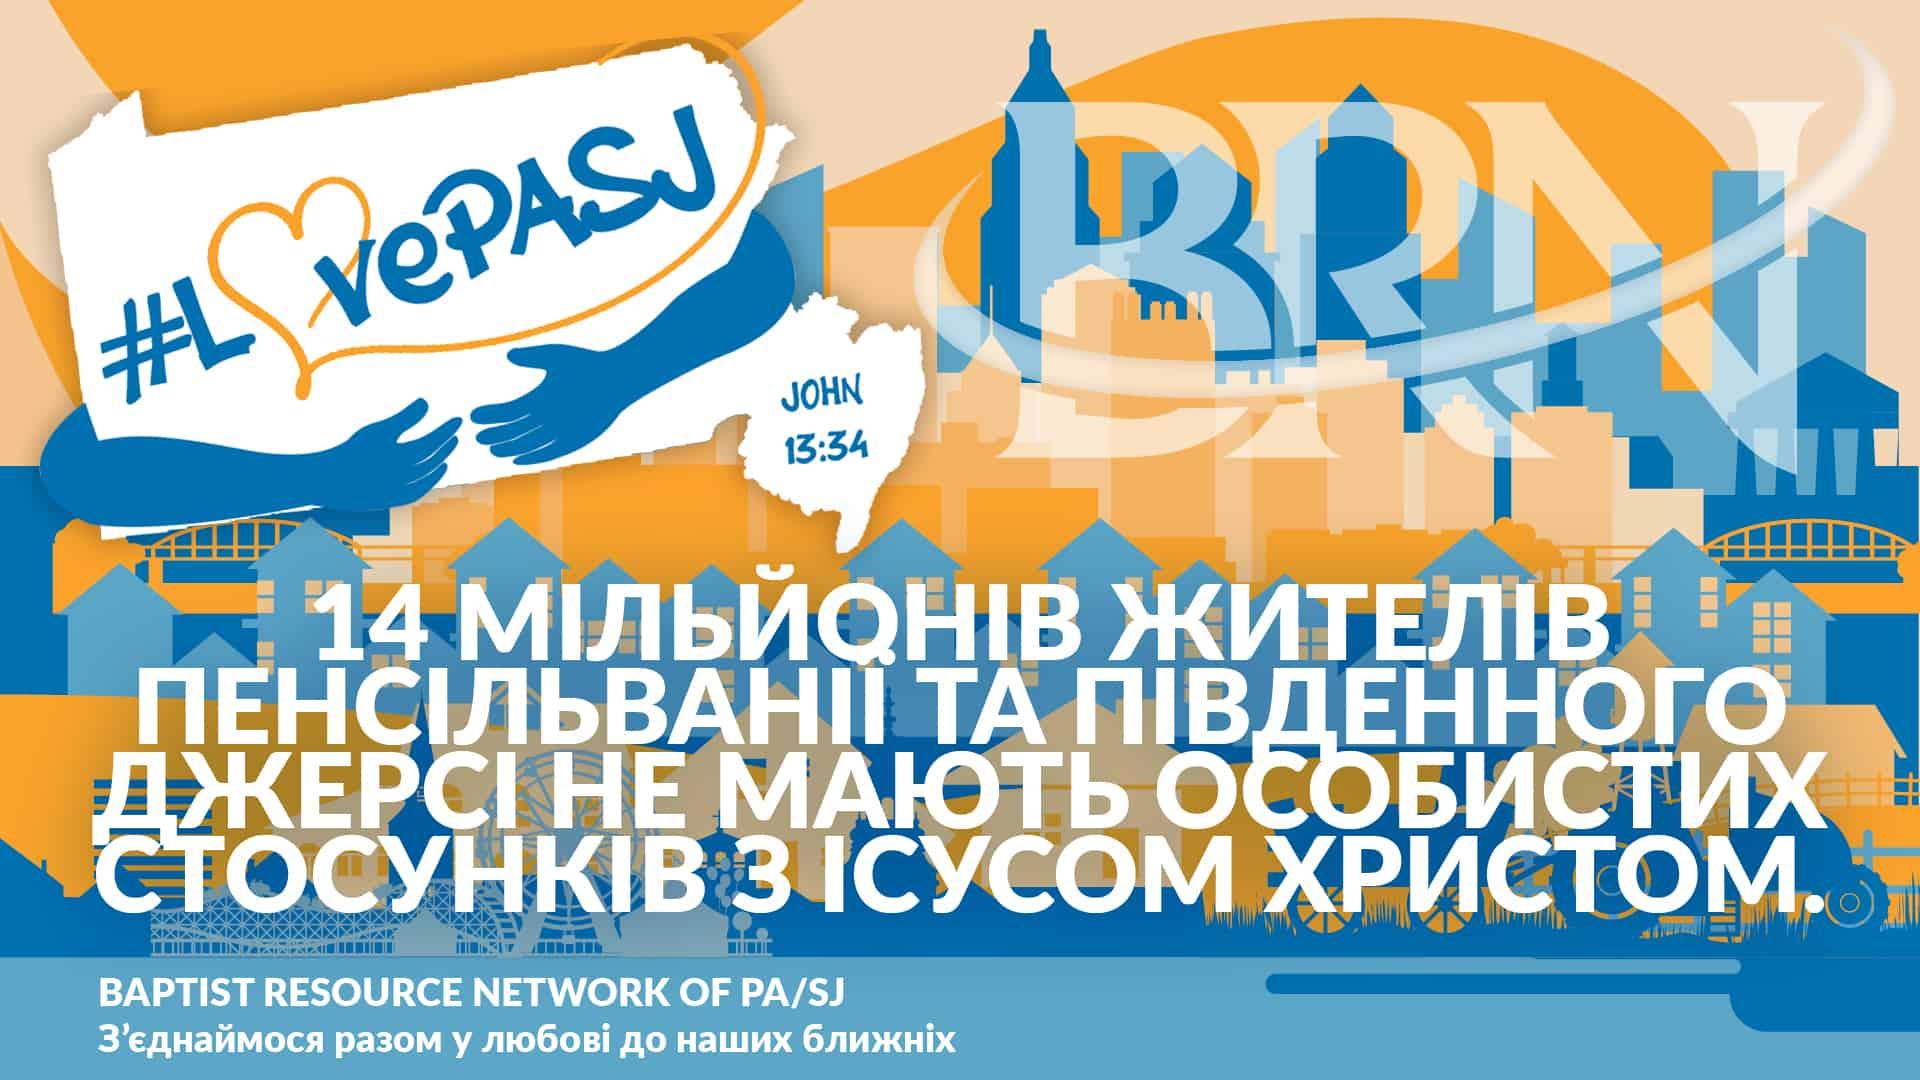 LovePASJ Slide 16x9 - Ukrainian